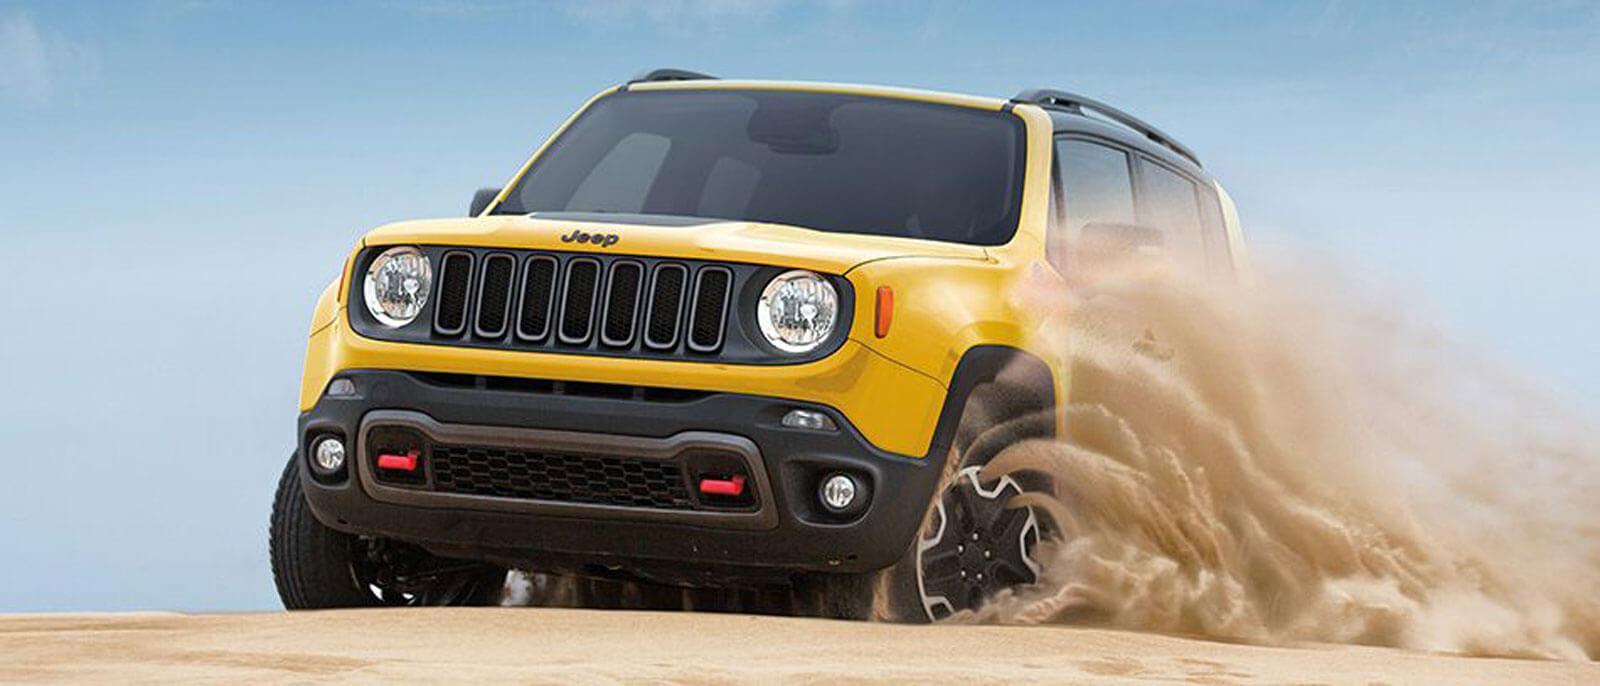 2016 Jeep Renegade driving through sand dunes